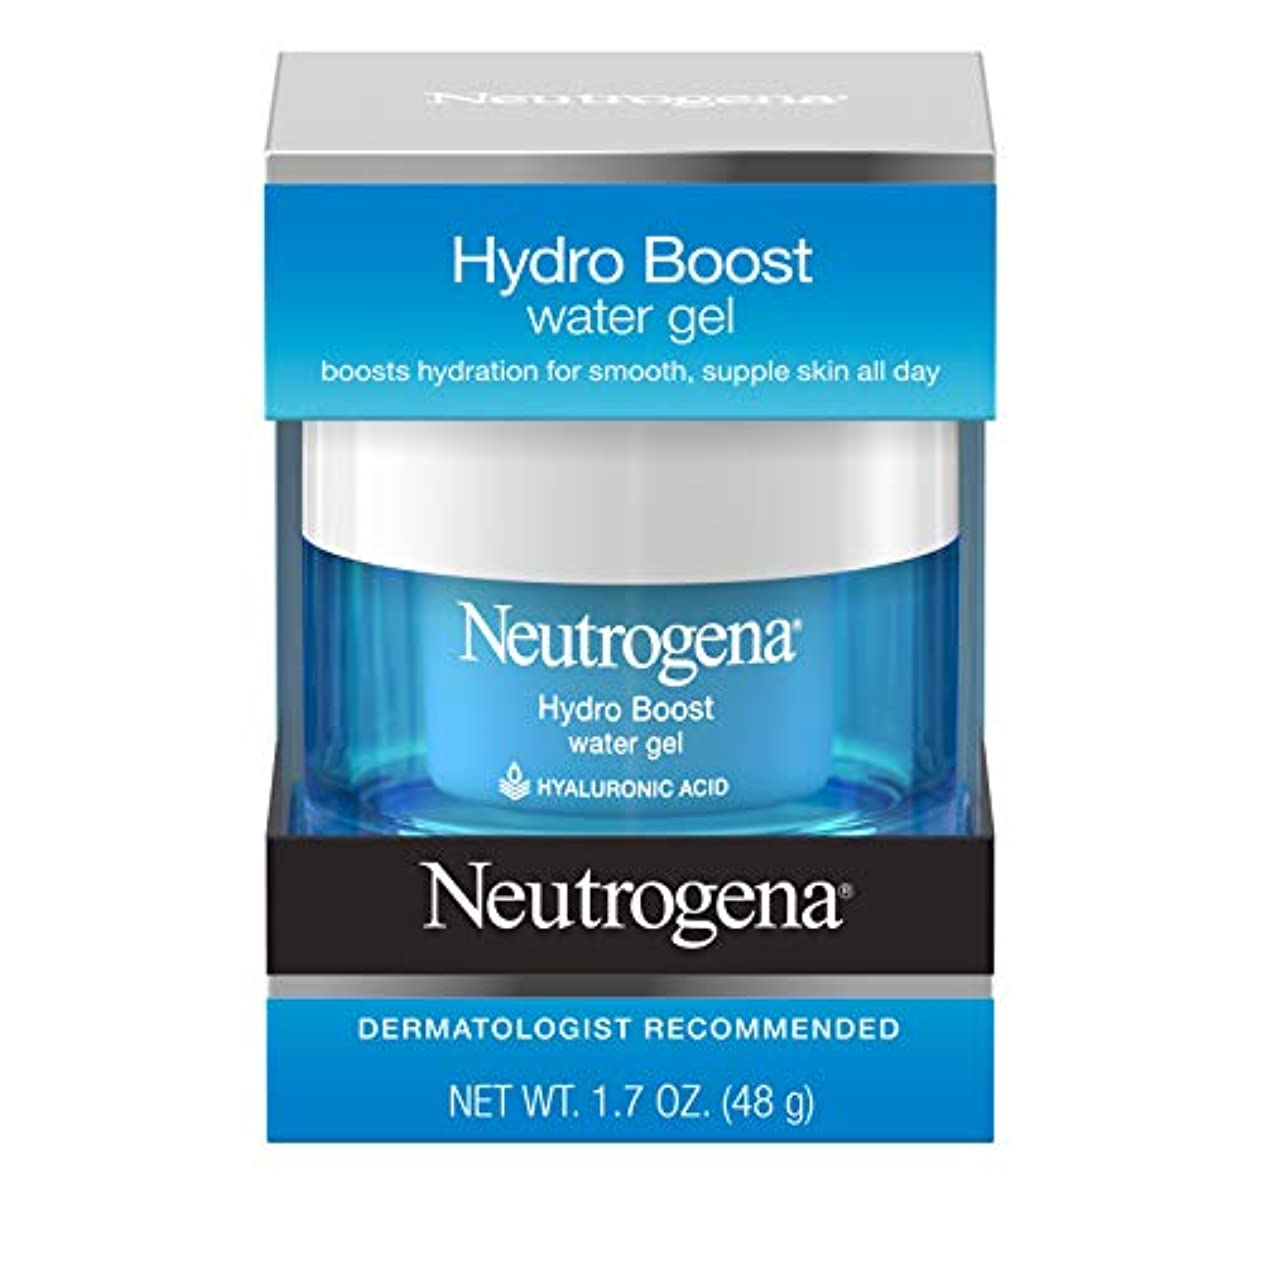 Neutrogena Hydro Boost Water Gel、1.7 FL。Oz